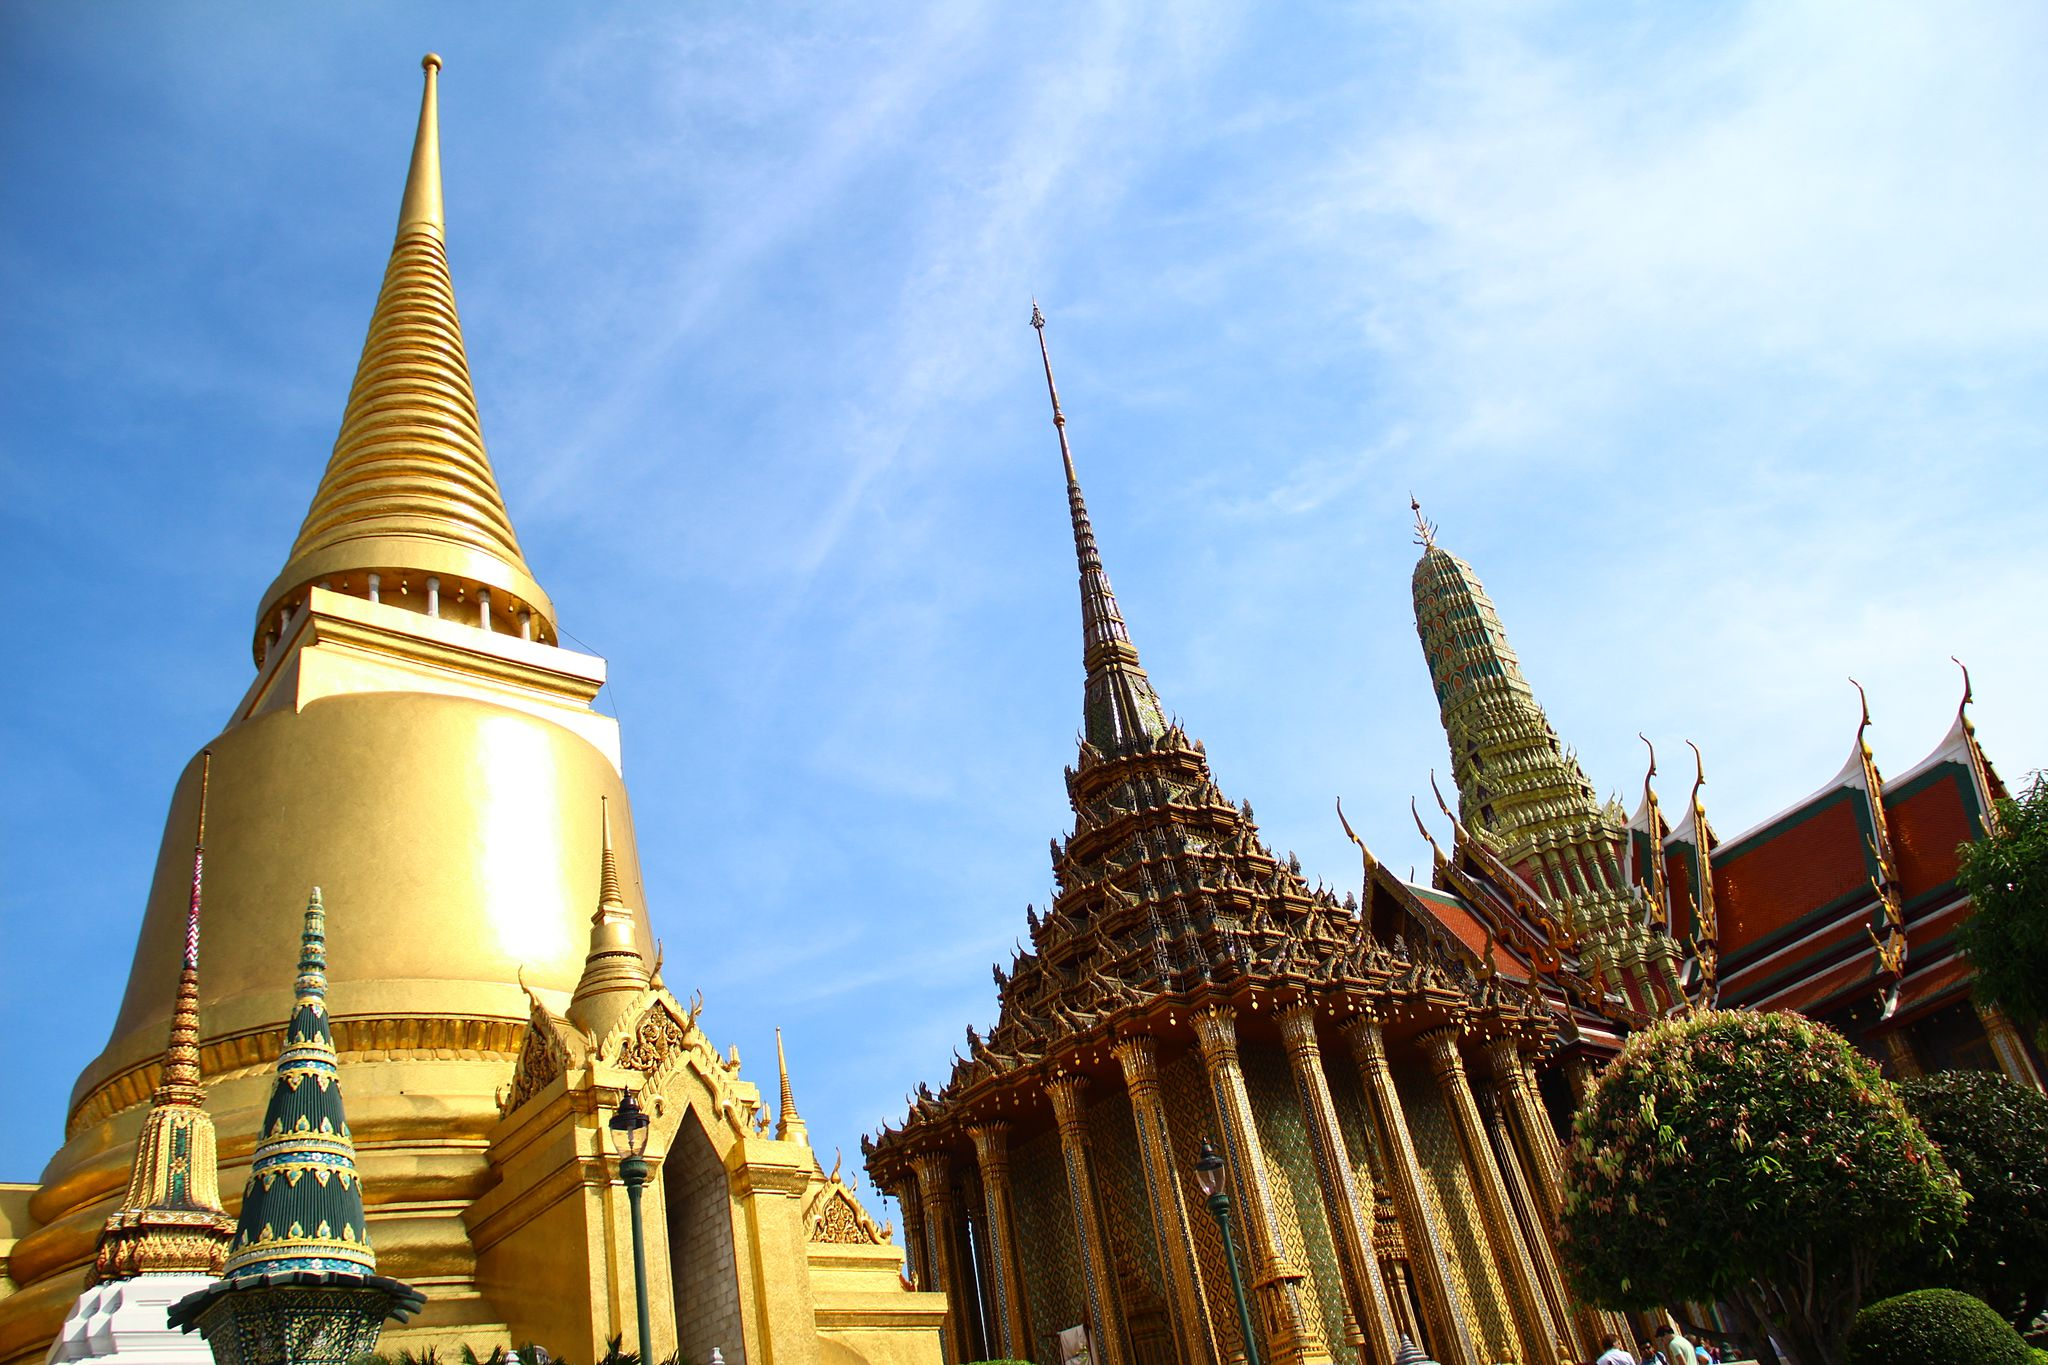 Wat Phra Kaew Temple and Stupa